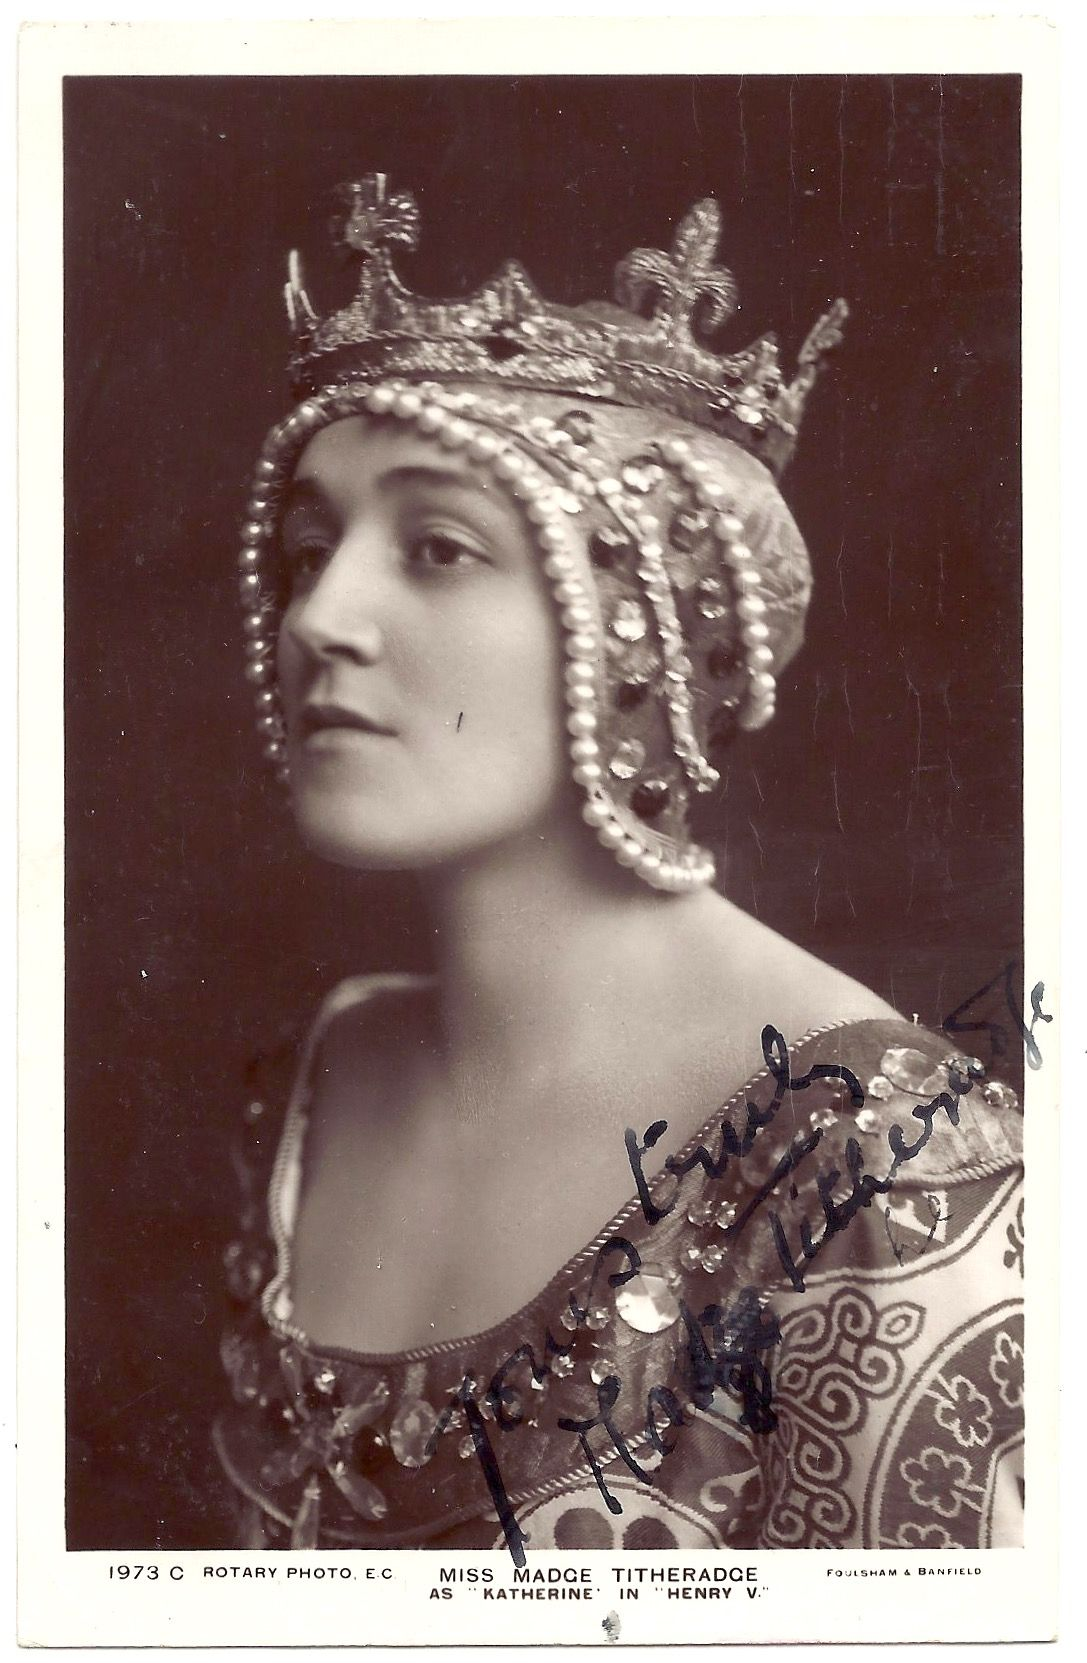 Madge Titheradge Madge Titheradge new foto